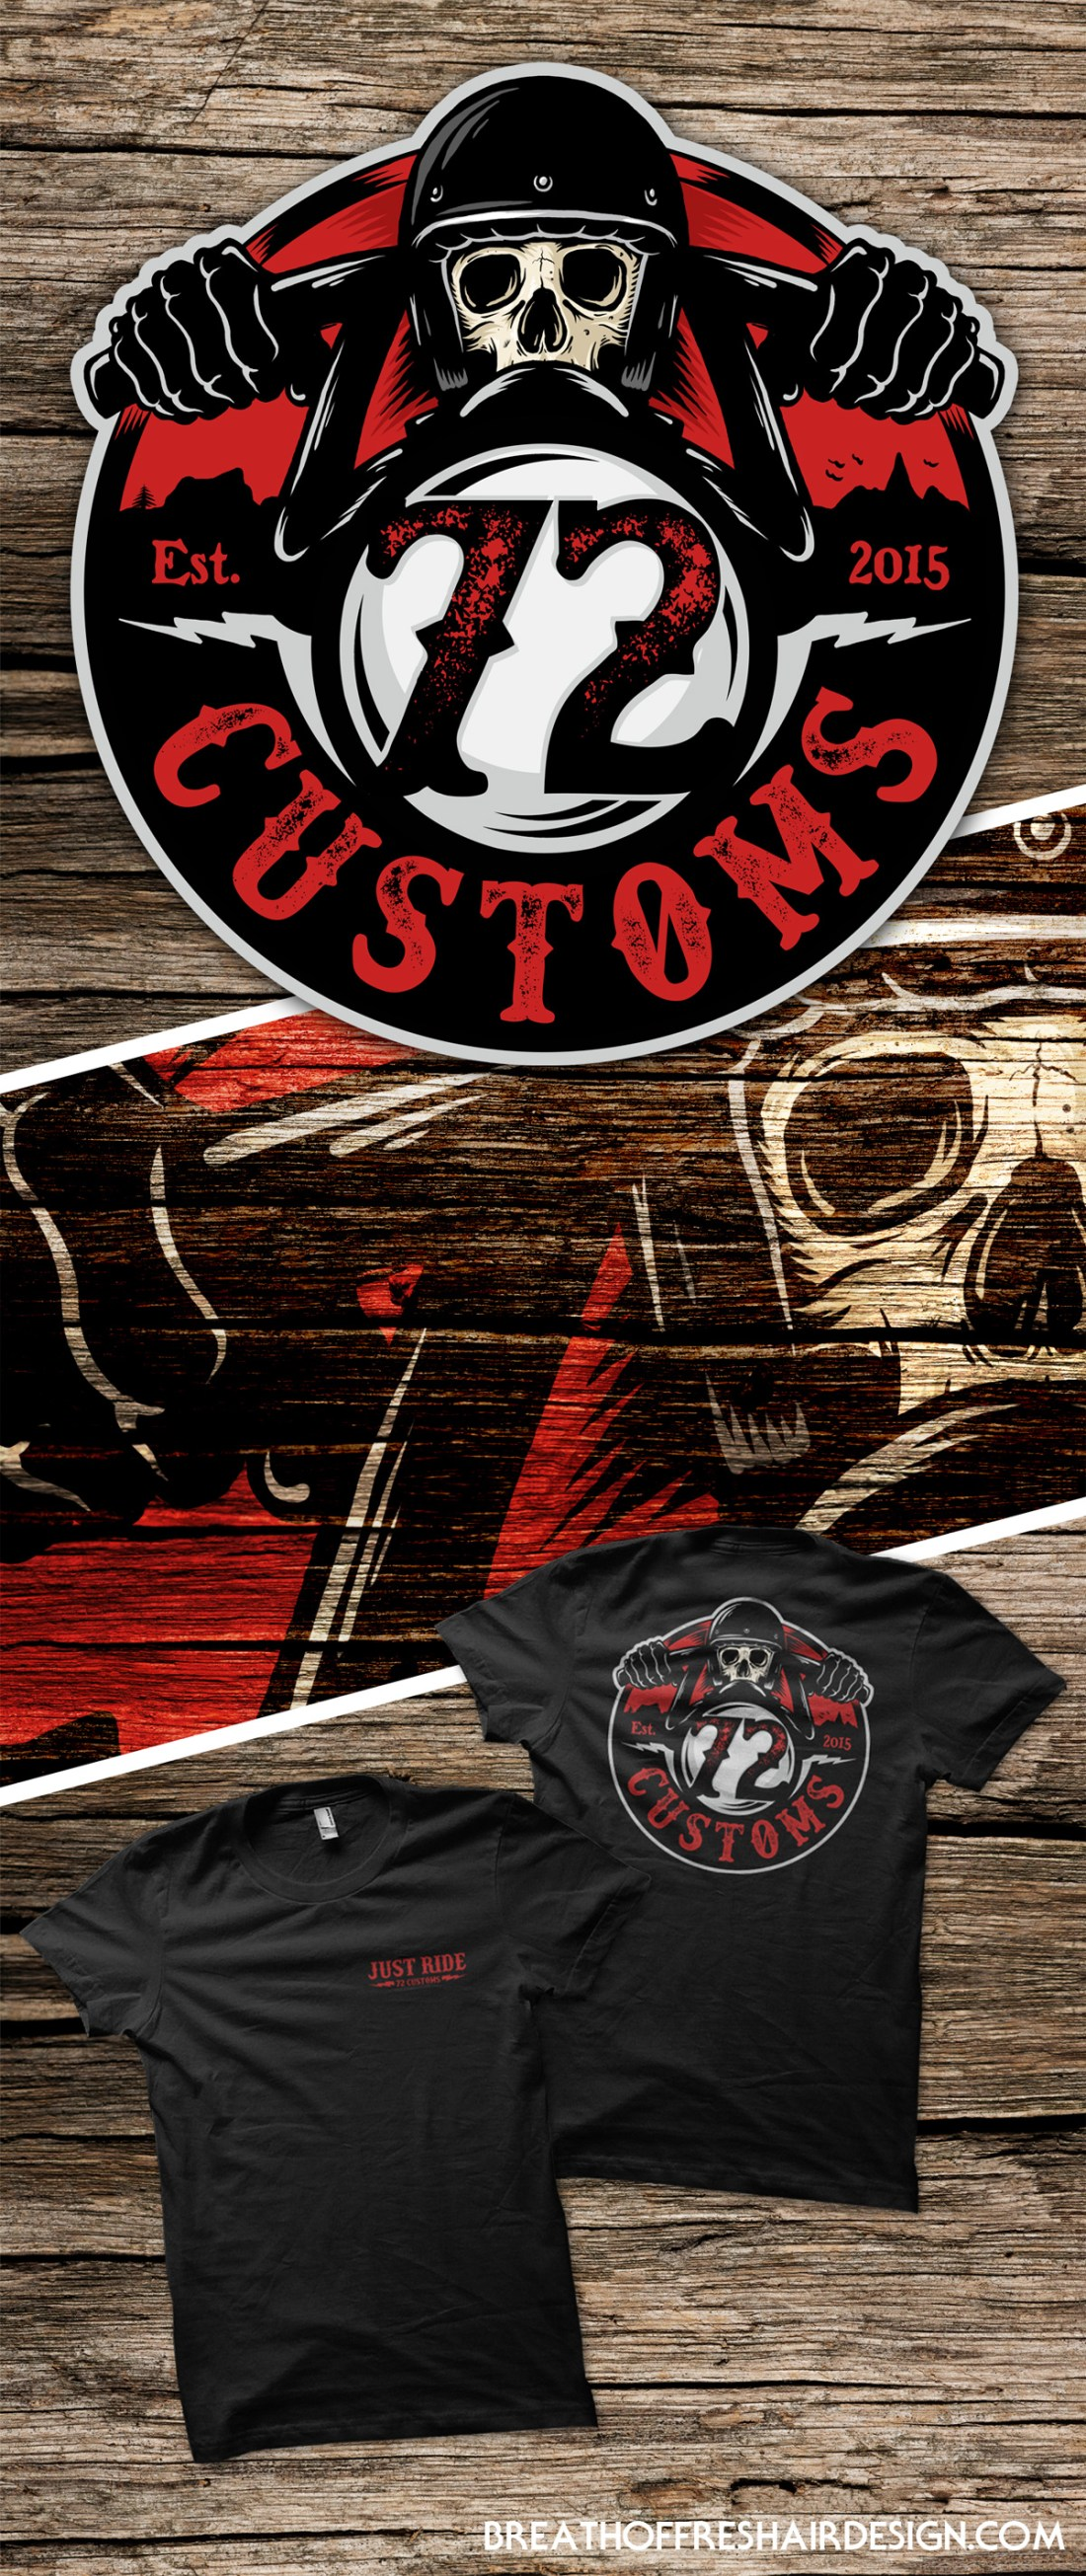 72 Customs, Logo, Illustration, Design, Motorcycles, Choppers, Skull, Graphic Design, Toronto, Custom Art, T-Shirt Design